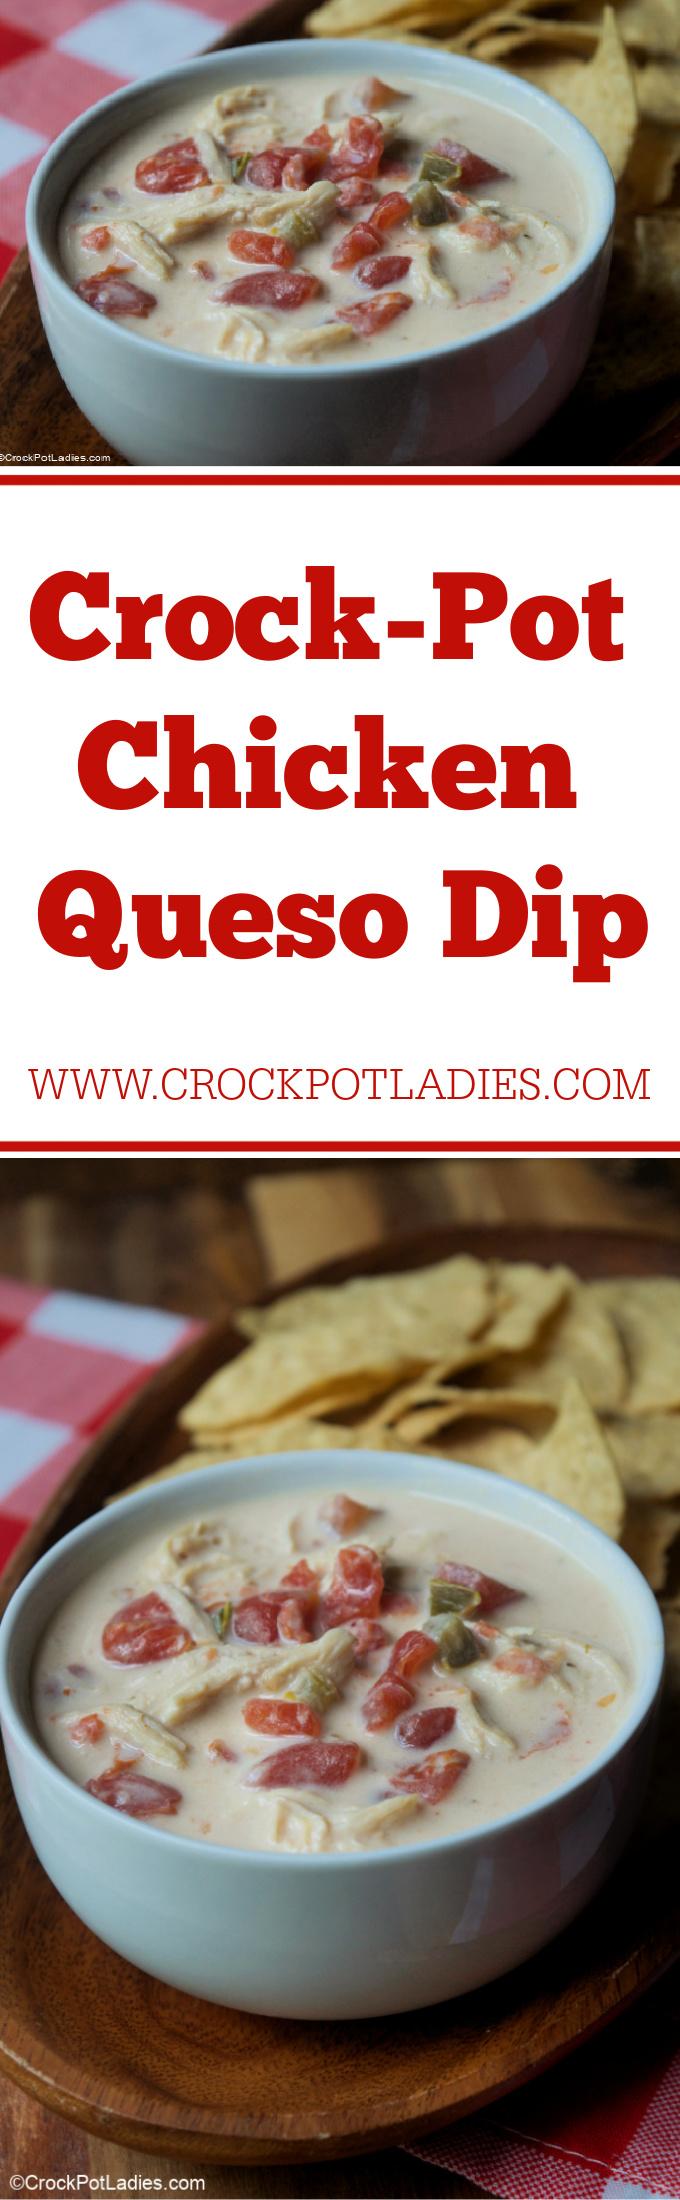 Crock-Pot Chicken Queso Dip